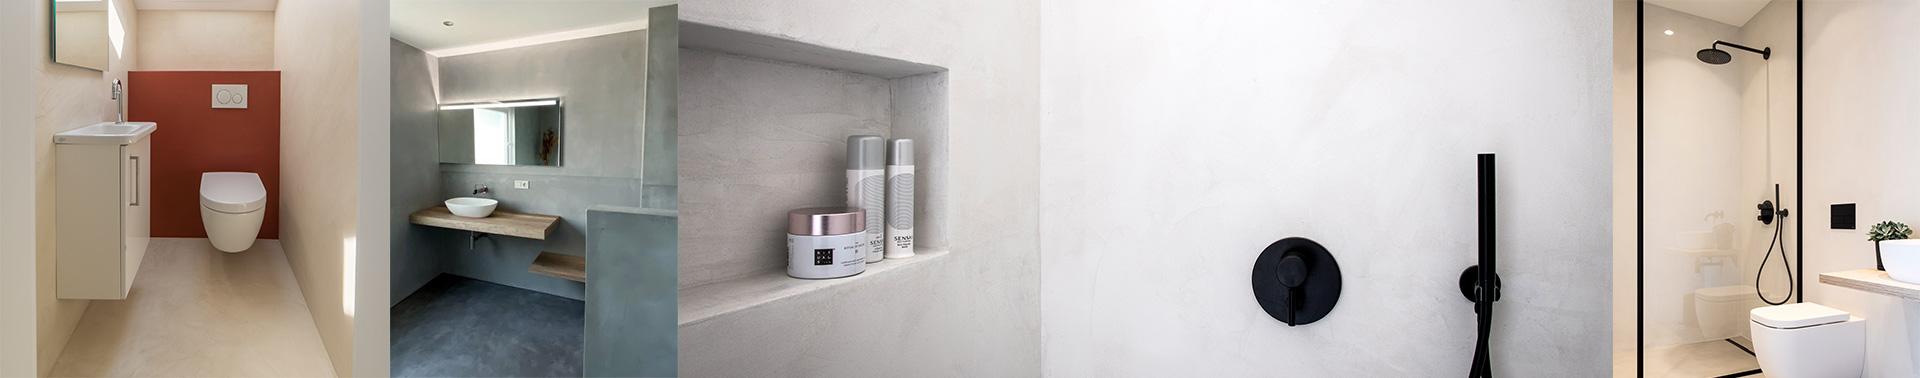 beton-cire-badezimmer-raumkonzept-luxemburg-header